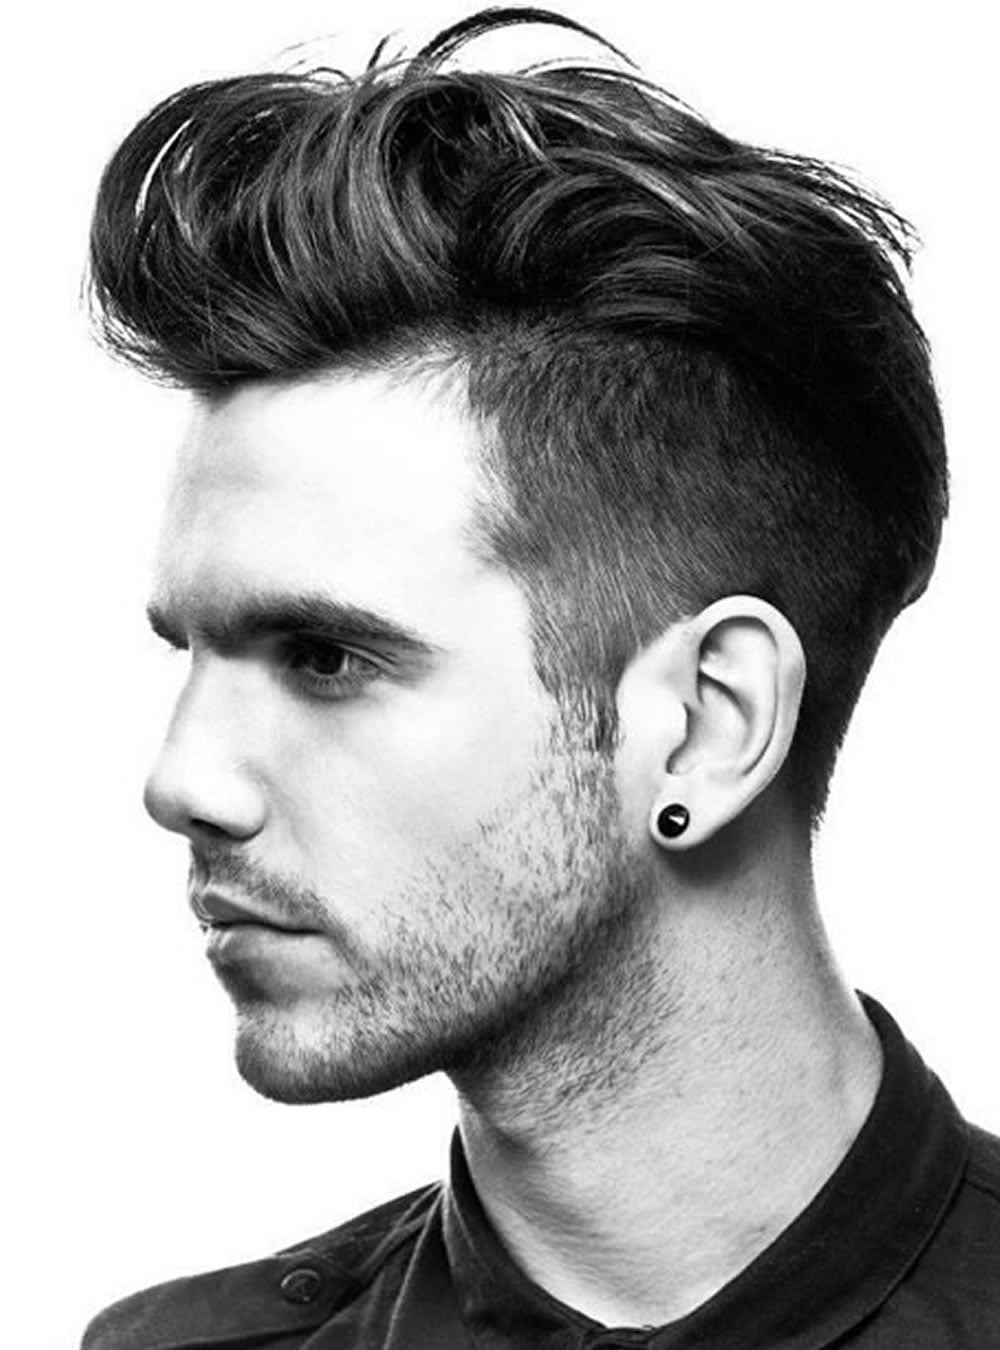 Pompadour Hairstyles for Men 2018 - Modern, Fade, Big Volume, Side ...